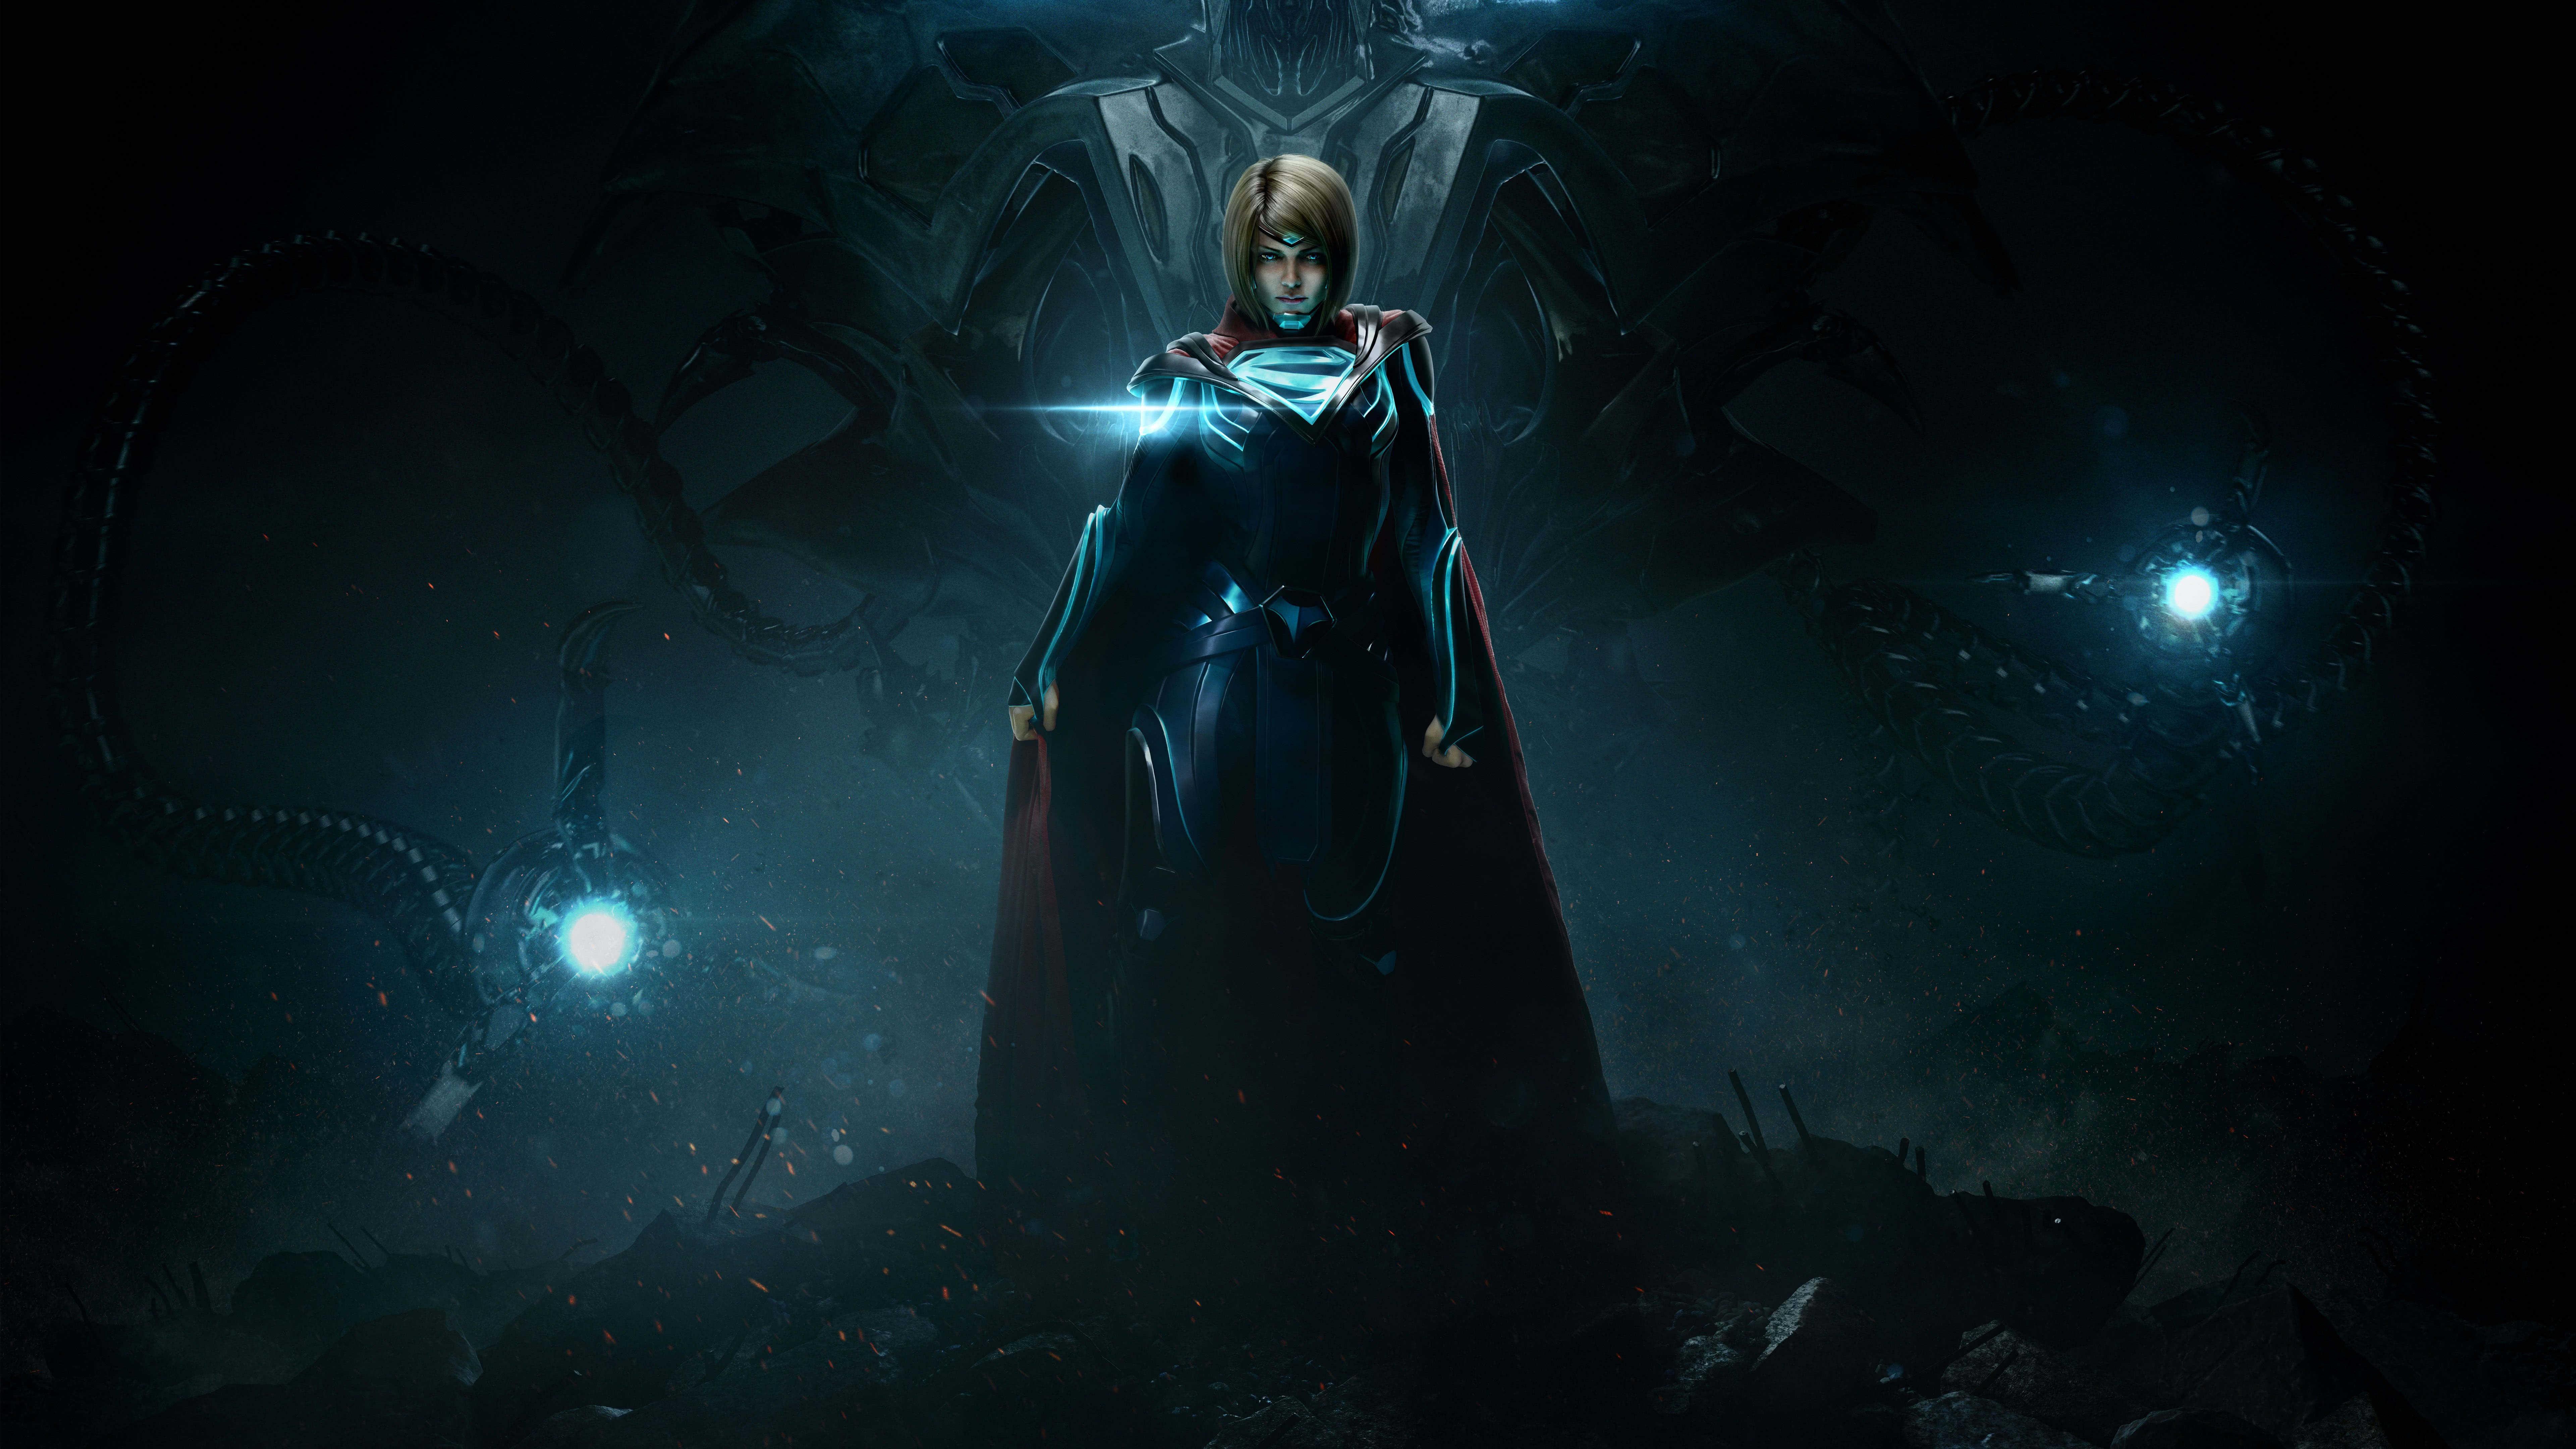 Free Download Injustice 2 Supergirl Uhd 8k Wallpaper Pixelz